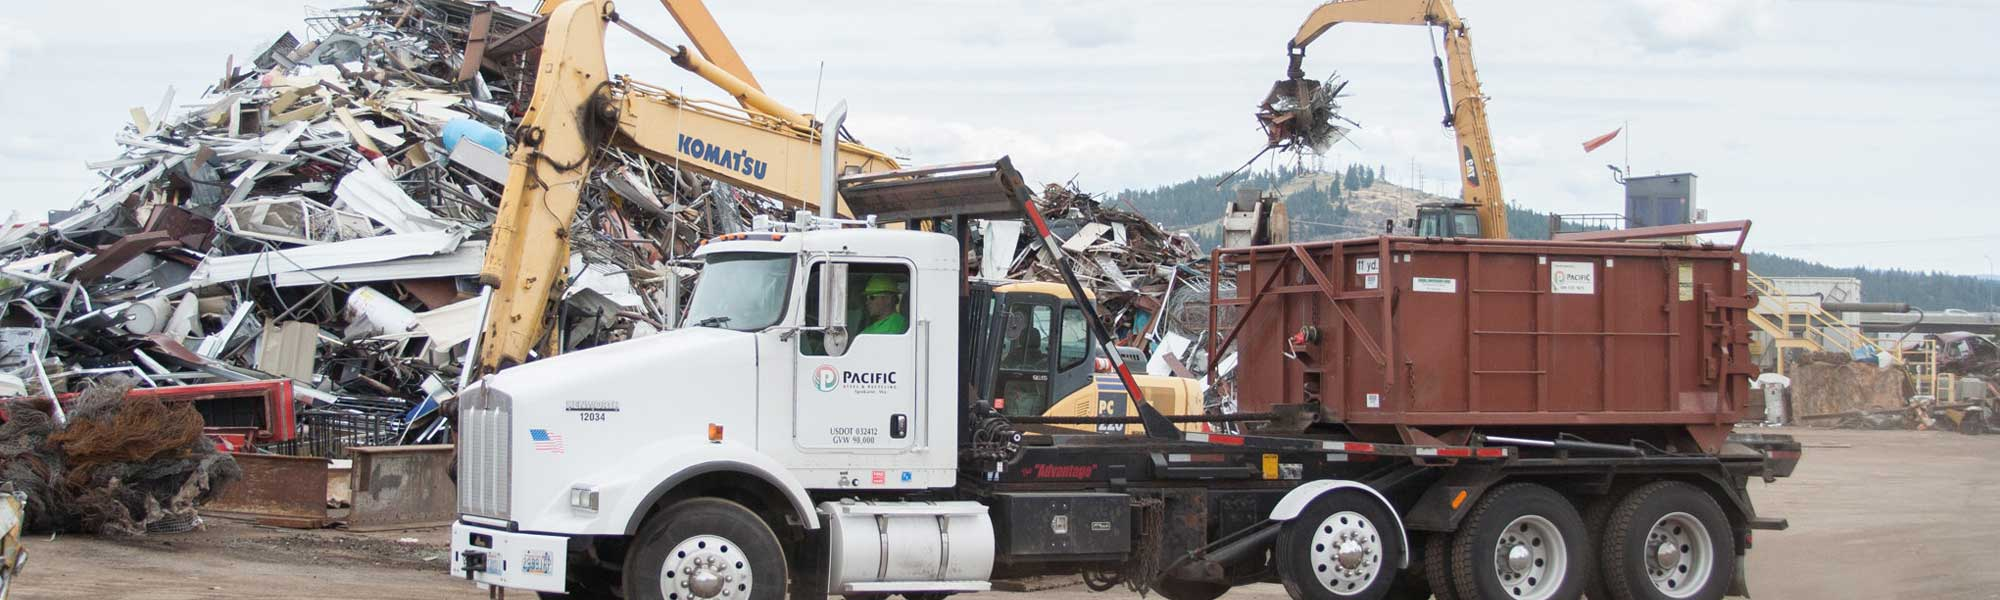 scrap metal yard with workers moving scrap metal